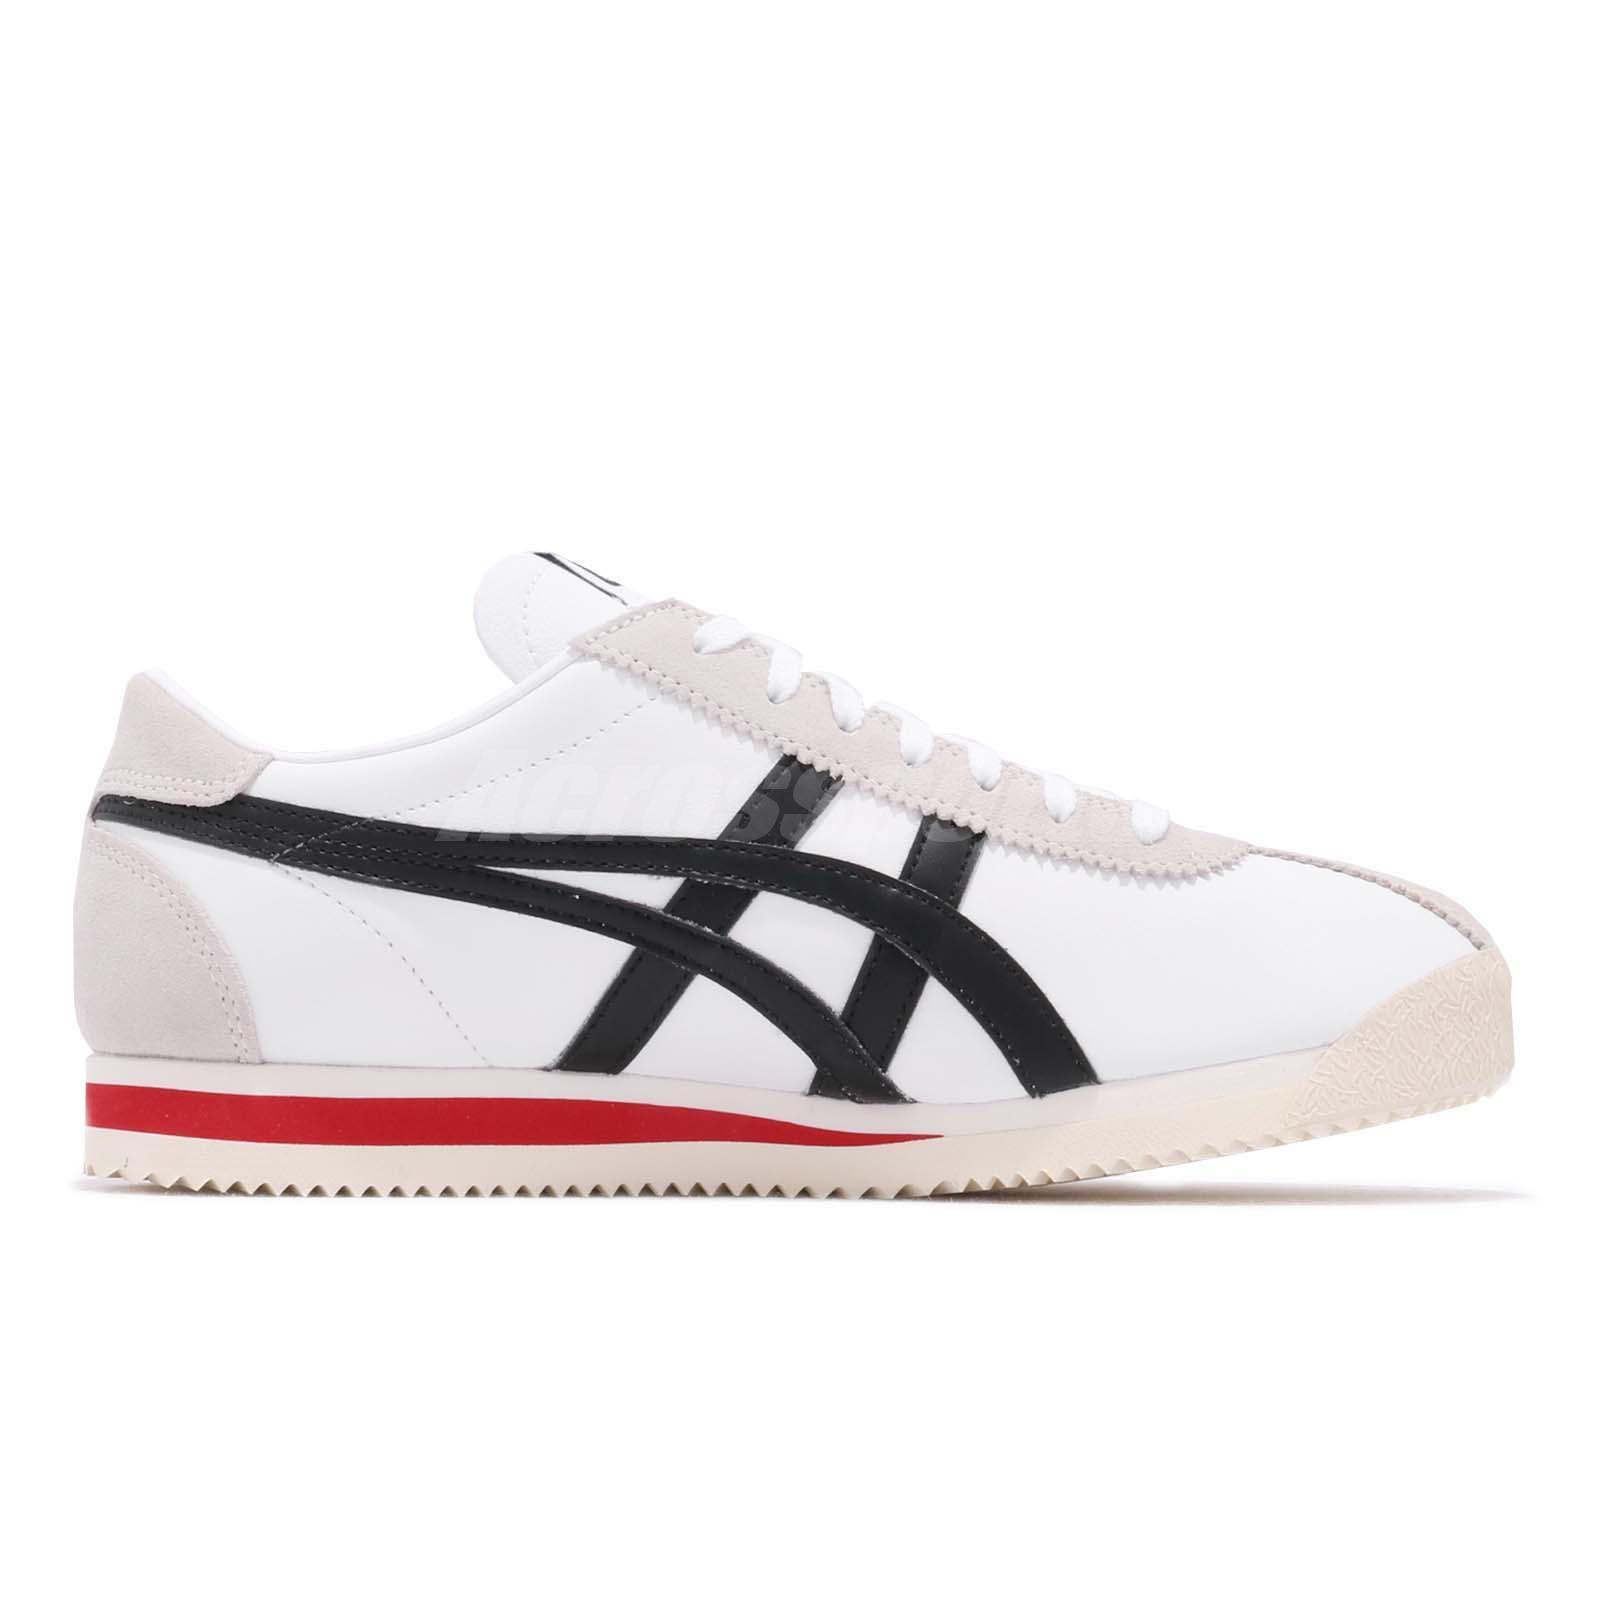 77babb77d974e Asics Onitsuka Tiger Corsair White Black Red Men Women Shoe Sneaker ...